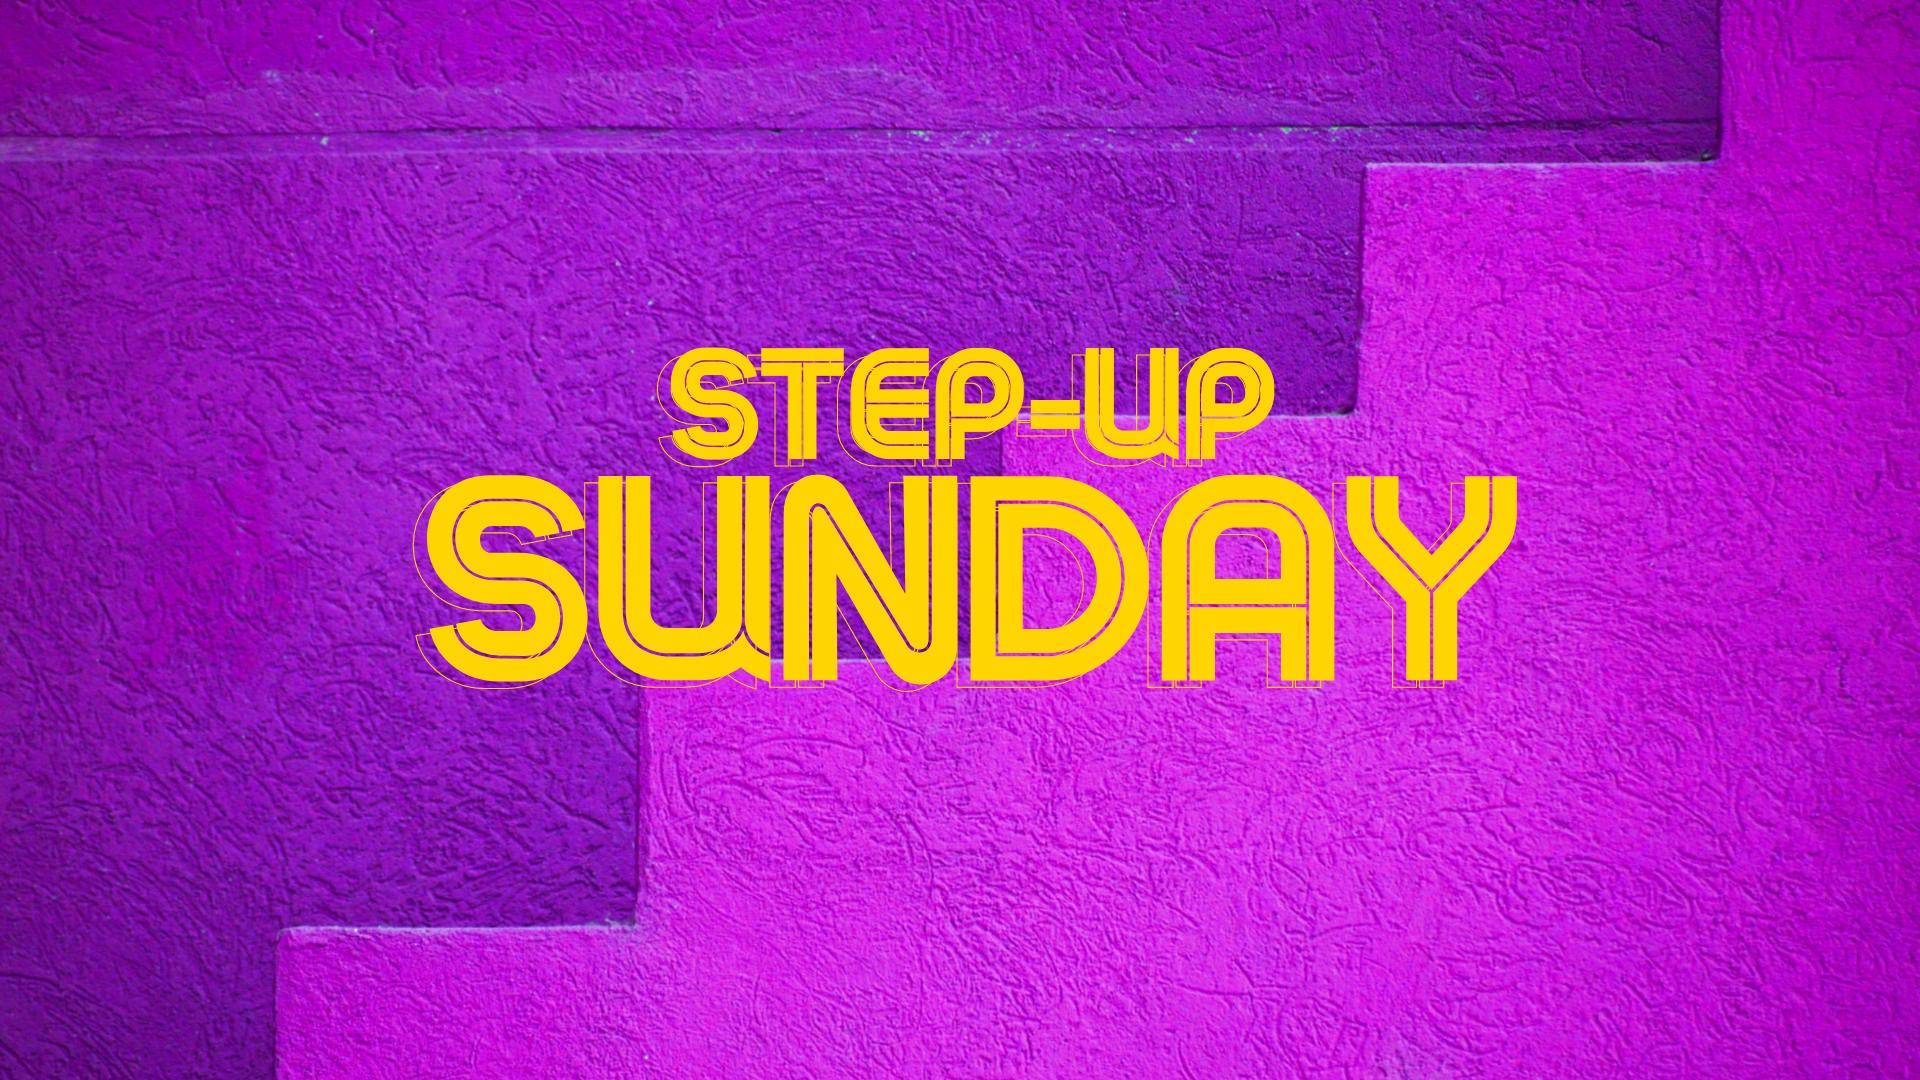 Step Up Sunday 2021